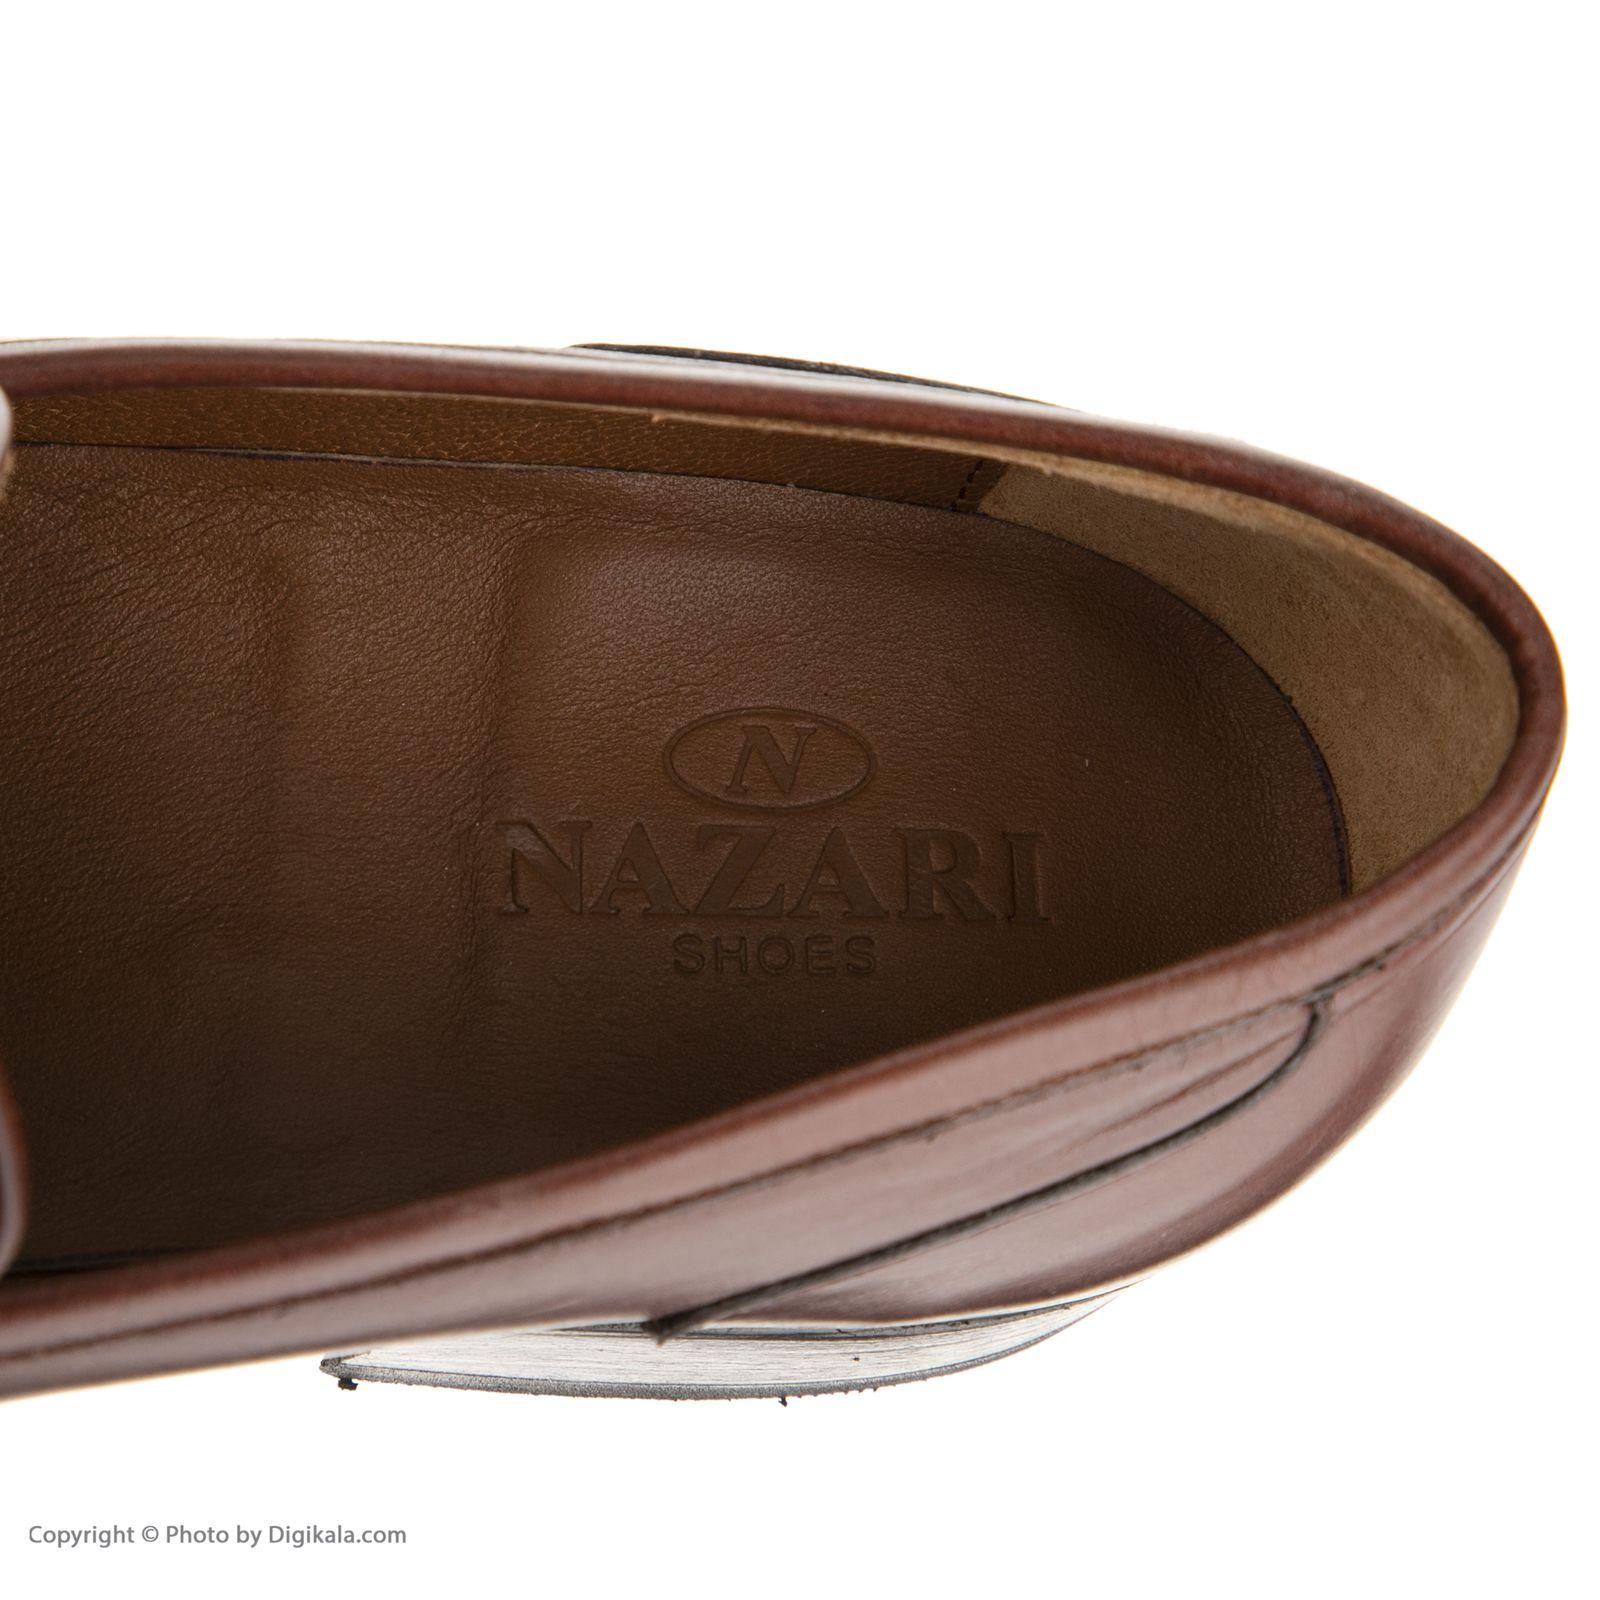 کفش مردانه نظری کد 431 -  - 8